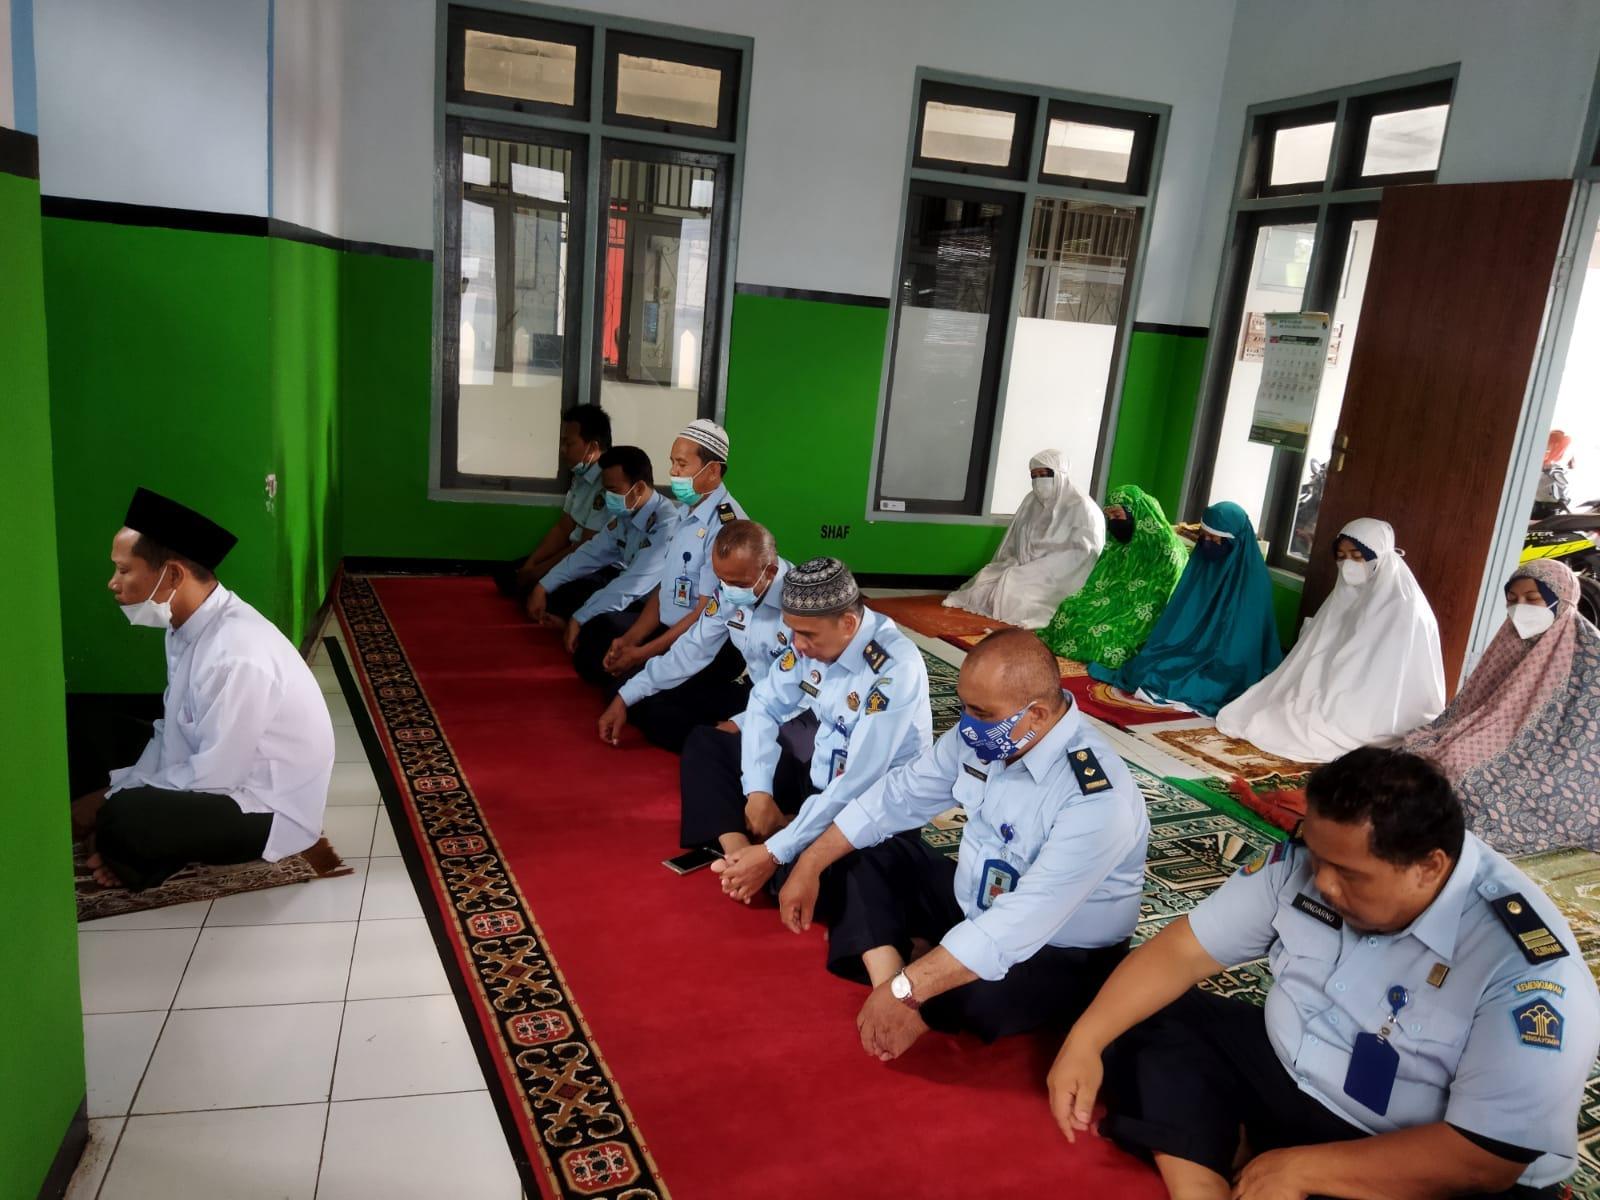 Doakan WBP Korban Musibah Lapas I Tangerang, Rupbasan Gelar Sholat Ghaib